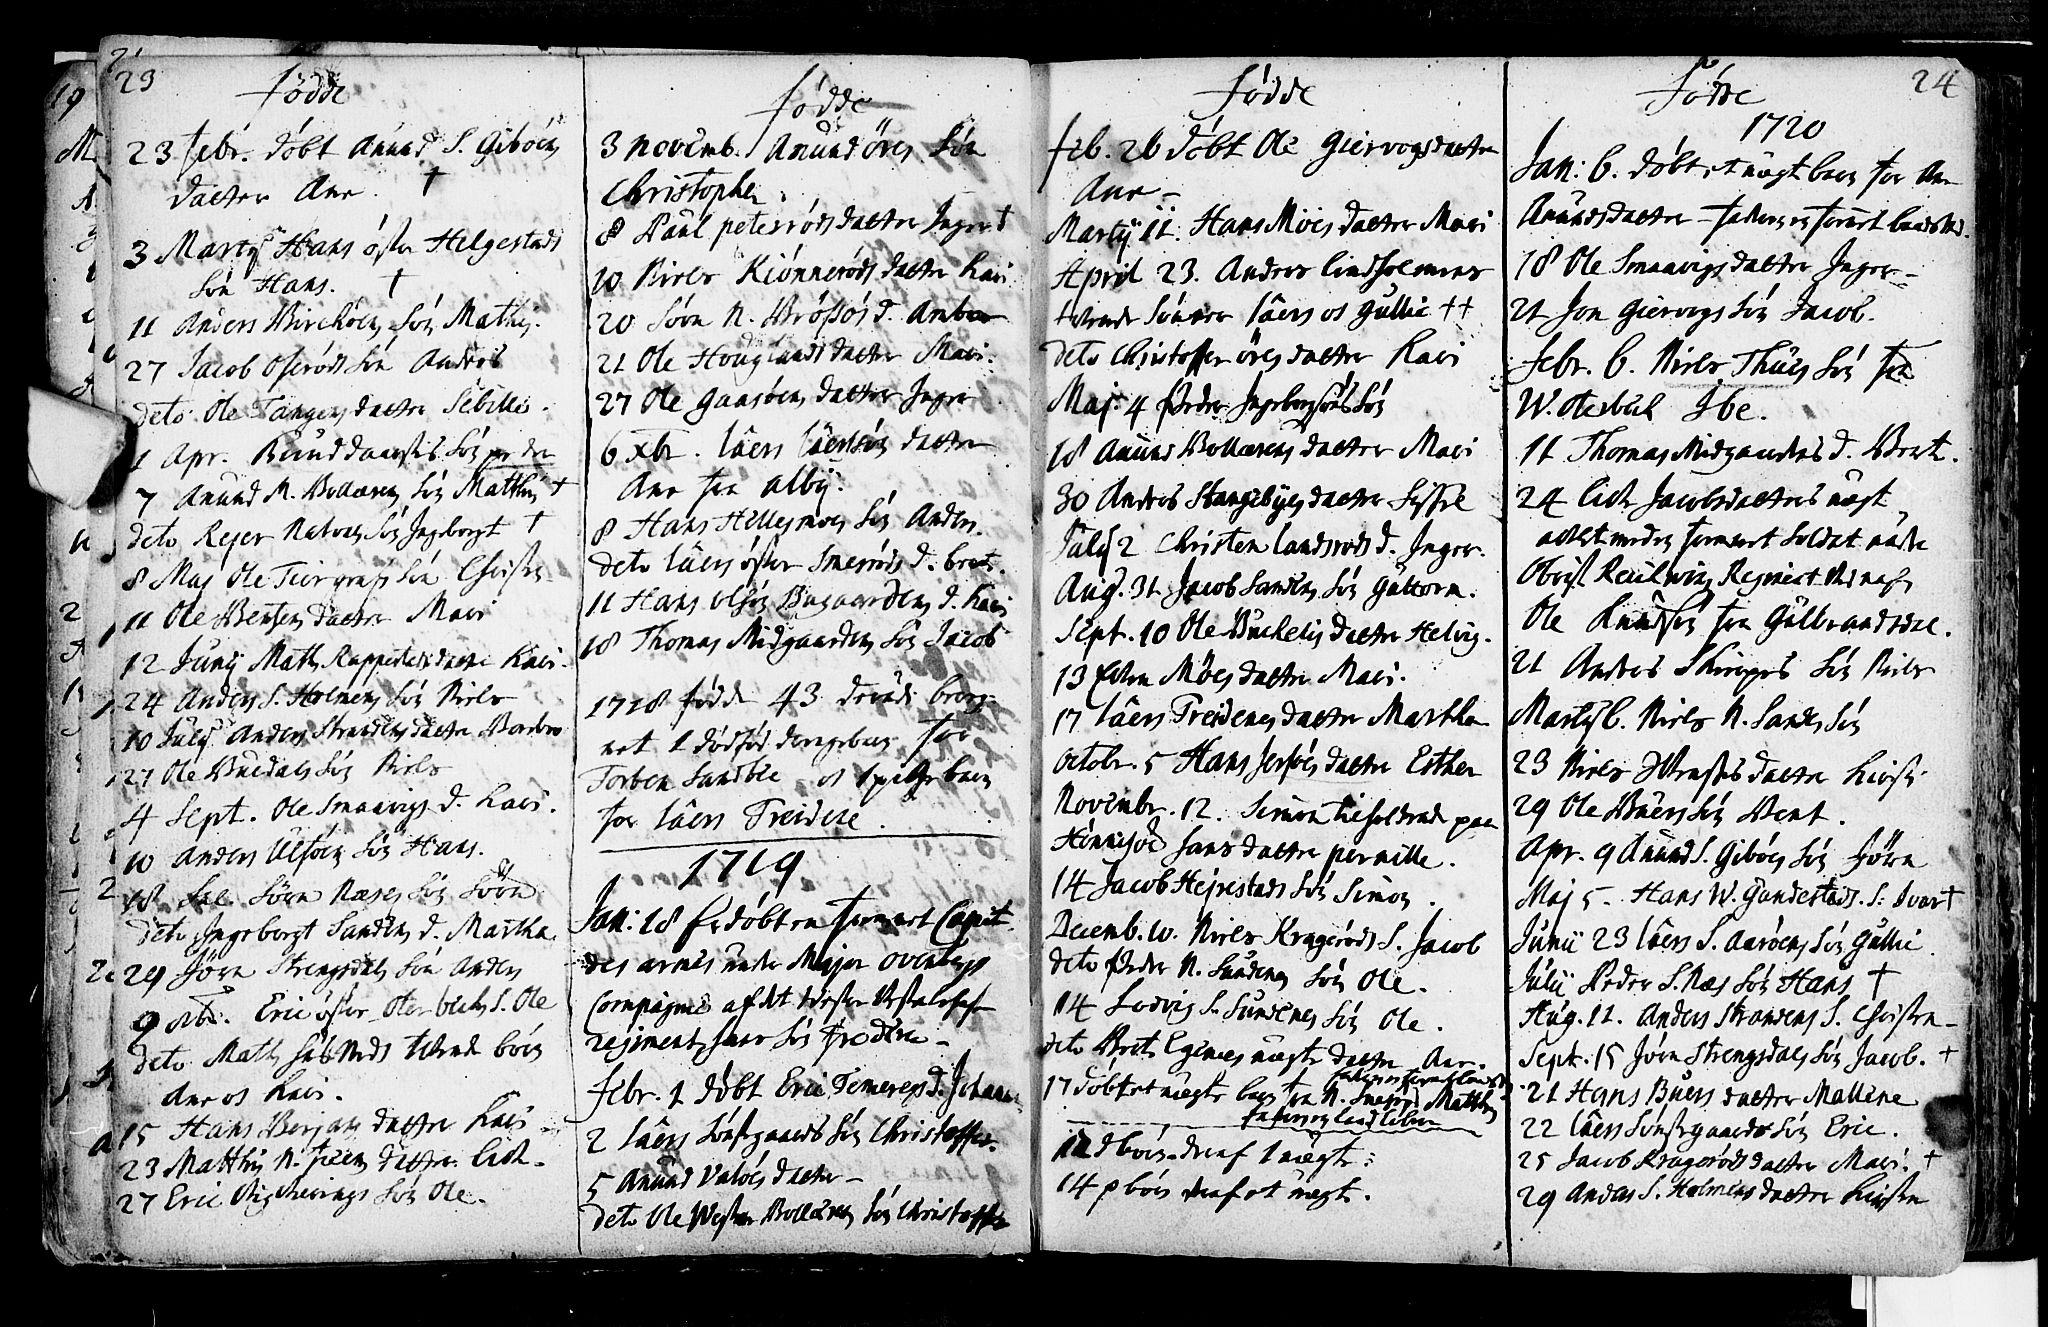 SAKO, Nøtterøy kirkebøker, F/Fa/L0001: Ministerialbok nr. I 1, 1686-1738, s. 23-24